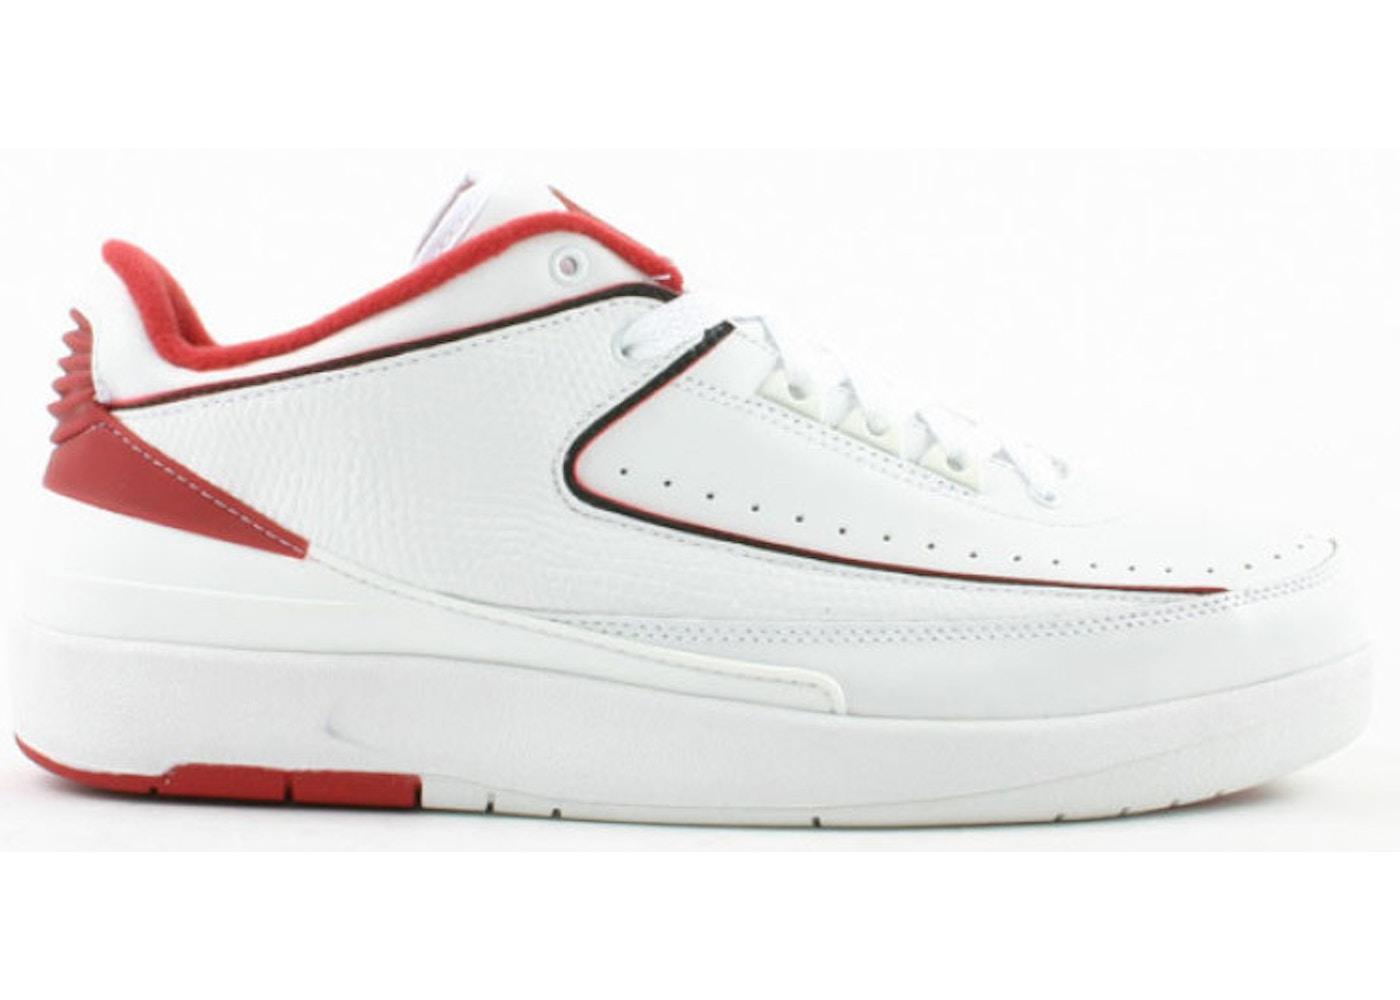 official photos b9fb5 dc5b9 Jordan 2 Retro Low White Varsity Red